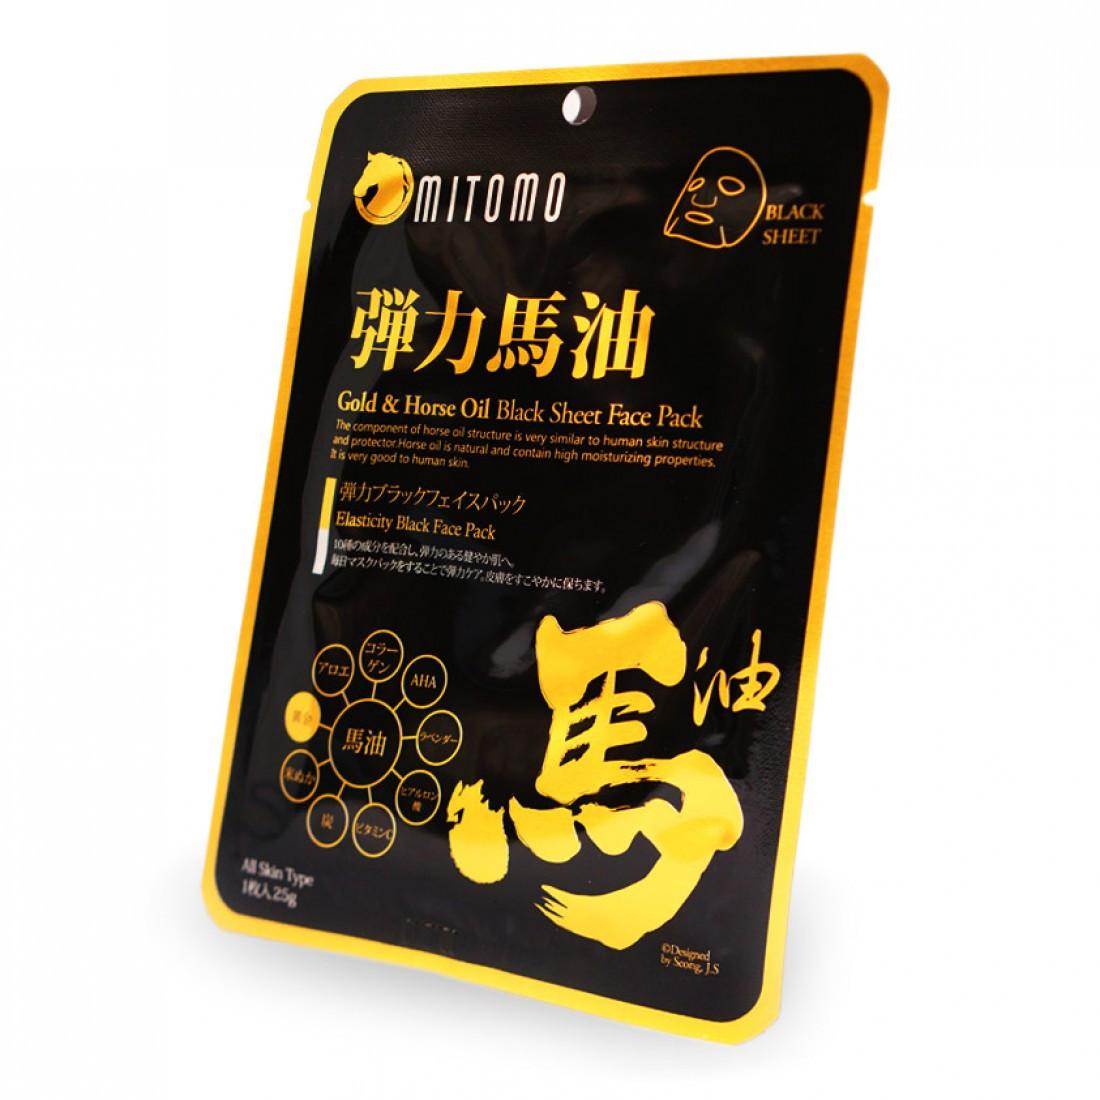 "Увлажняющая эластичная чёрная маска для лица ""Золото + Лошадиное масло"" Mitomo Essence Sheet Mask Syn-Ake + (4582419532502)"